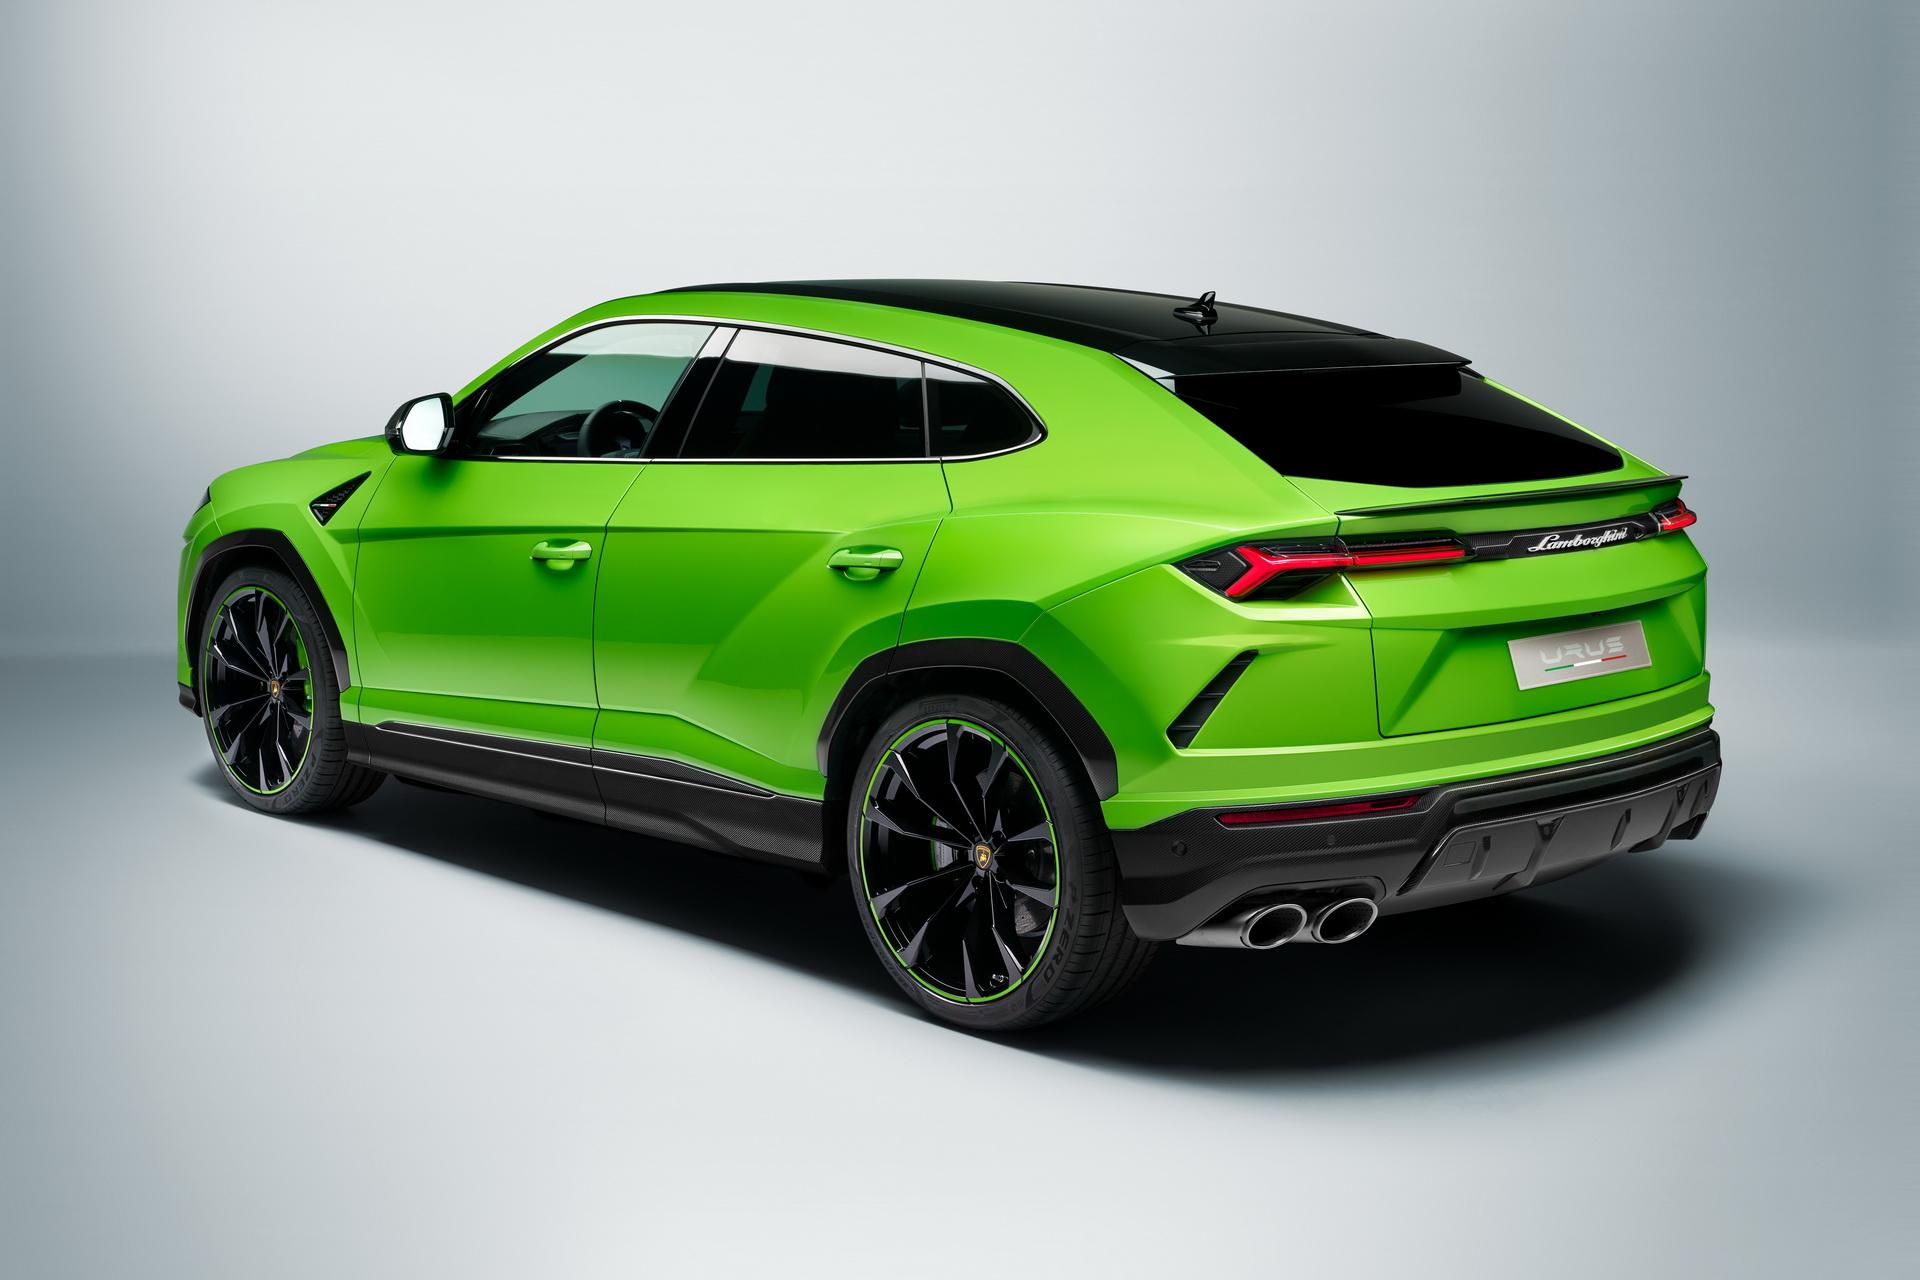 Lamborghini-Urus-Pearl-Capsule-Edition-2